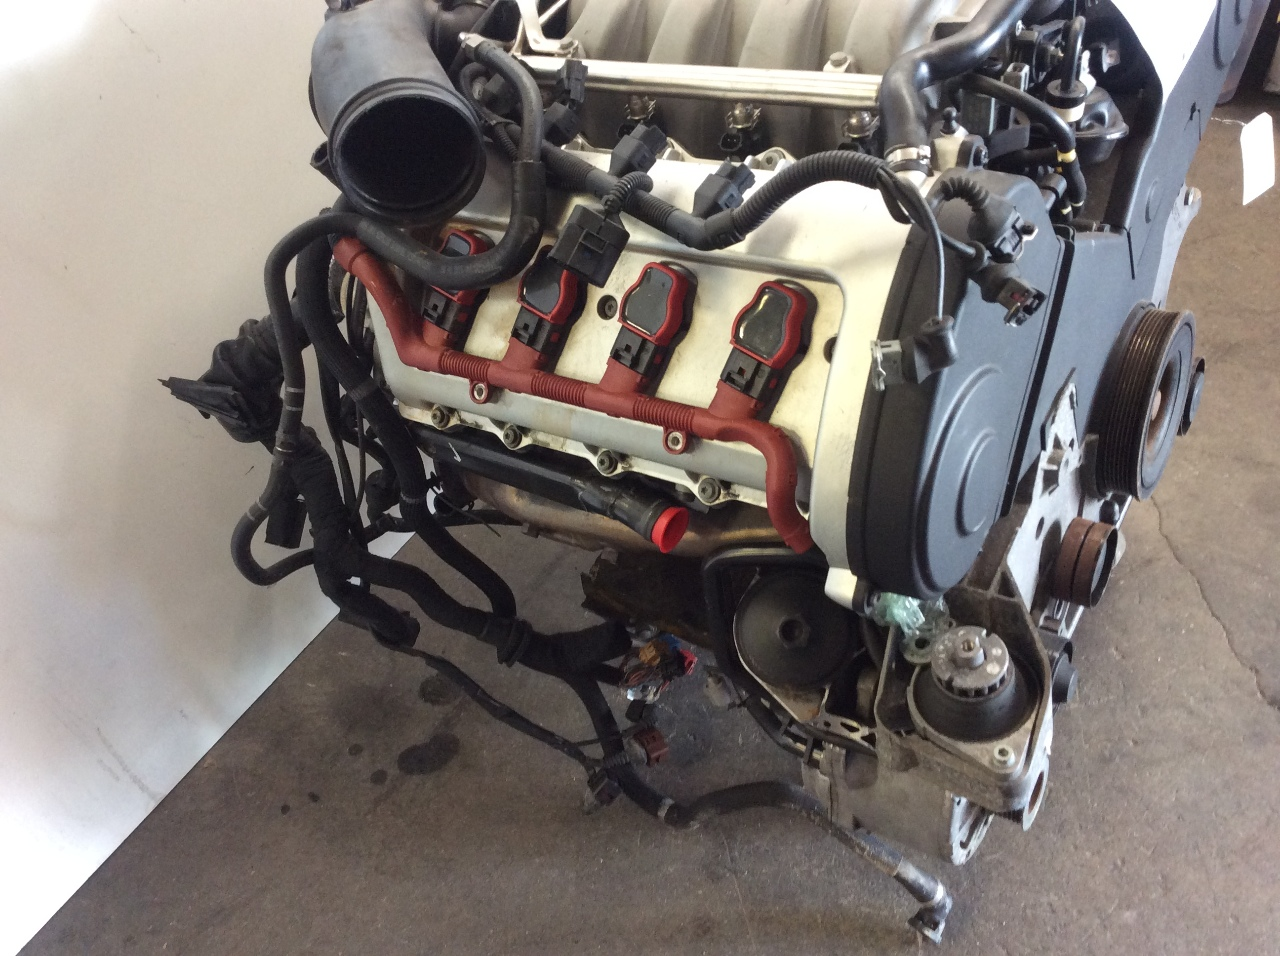 2004 2005 2006 audi a8 engine 4.2 motor bfm code | ebay 1999 audi a6 4 2 engine wiring 2006 audi a8 4 2 engine diagram #2